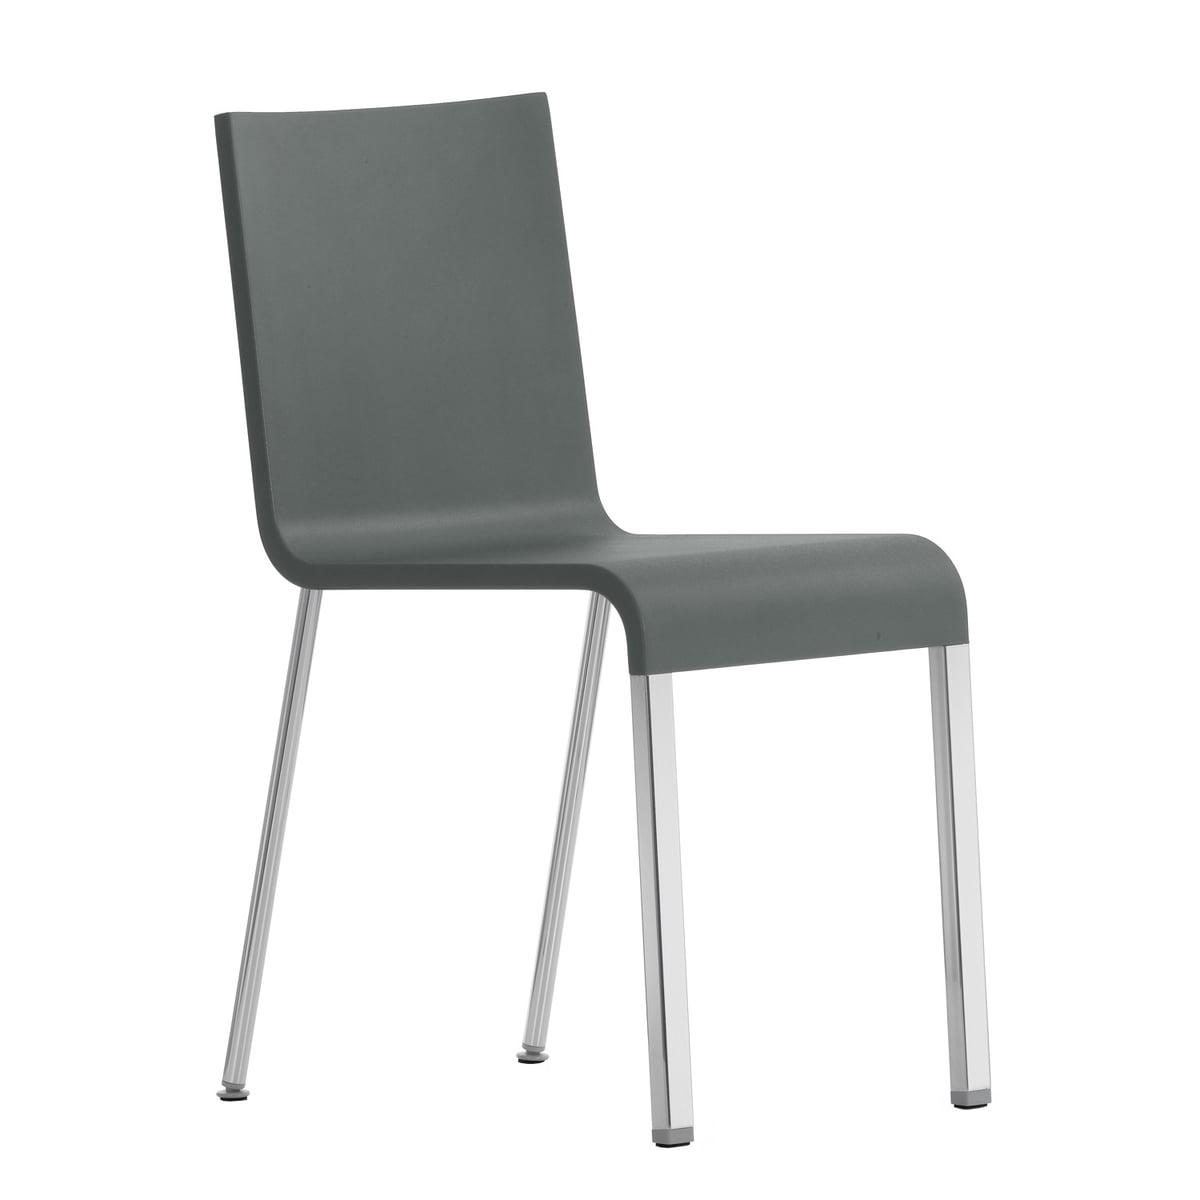 Vitra stuhl 03 im wohndesign shop entdecken for Vitra stuhl fake